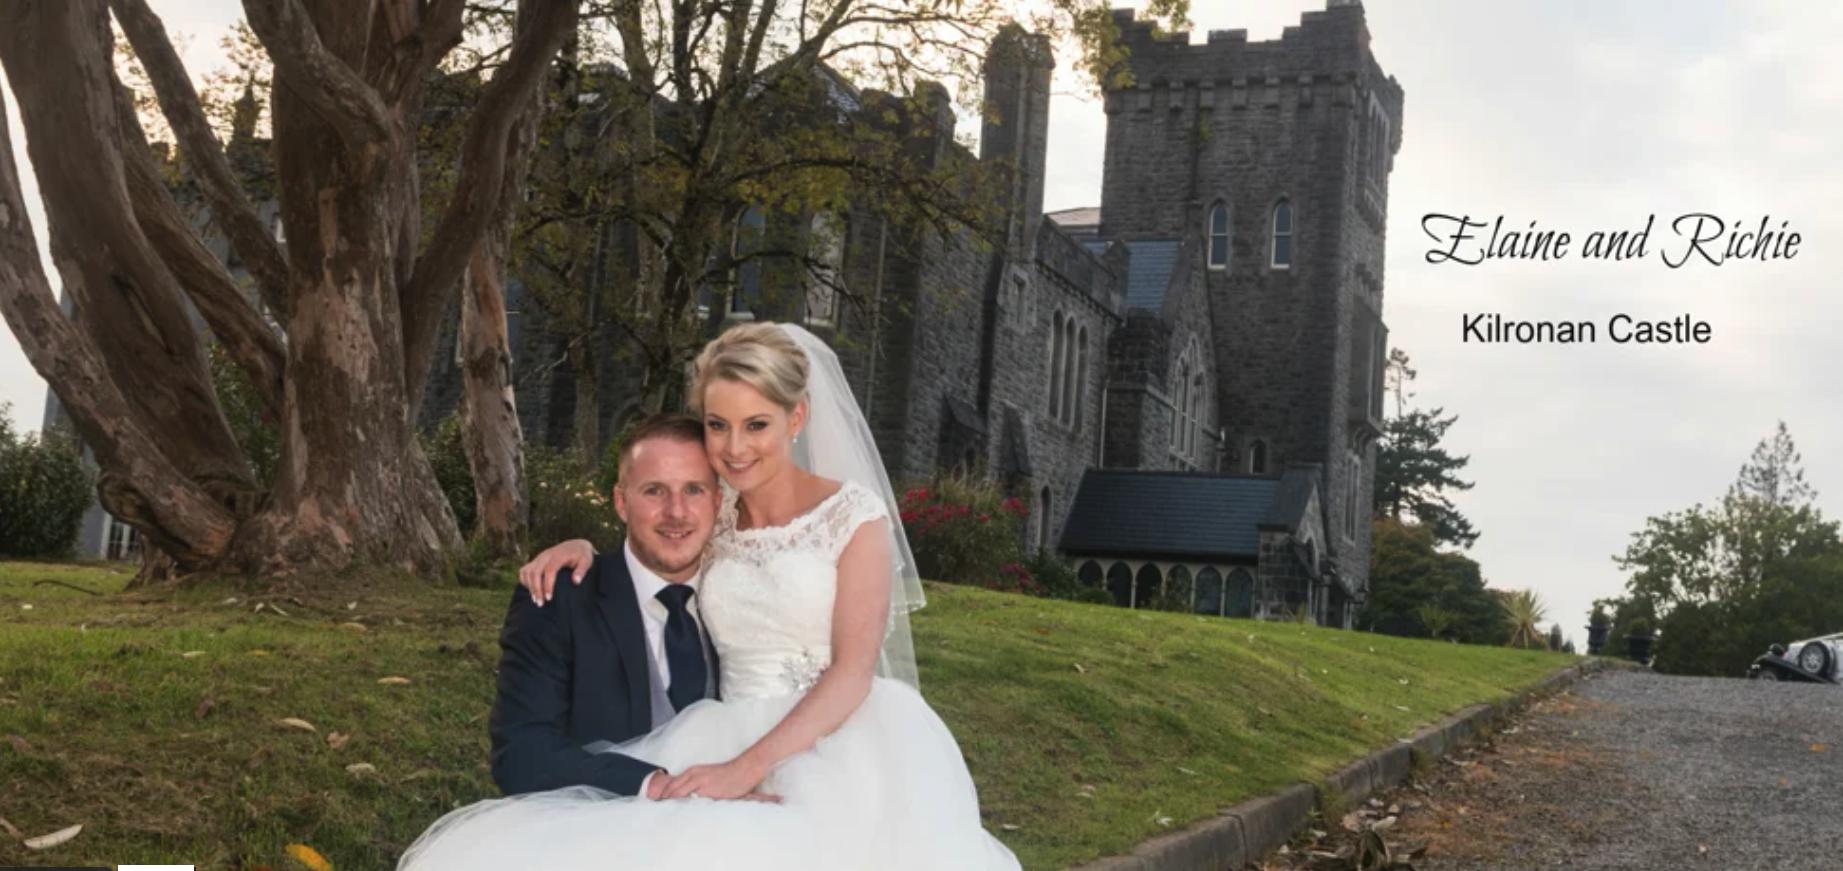 Wedding Videographer Kilronan Castle